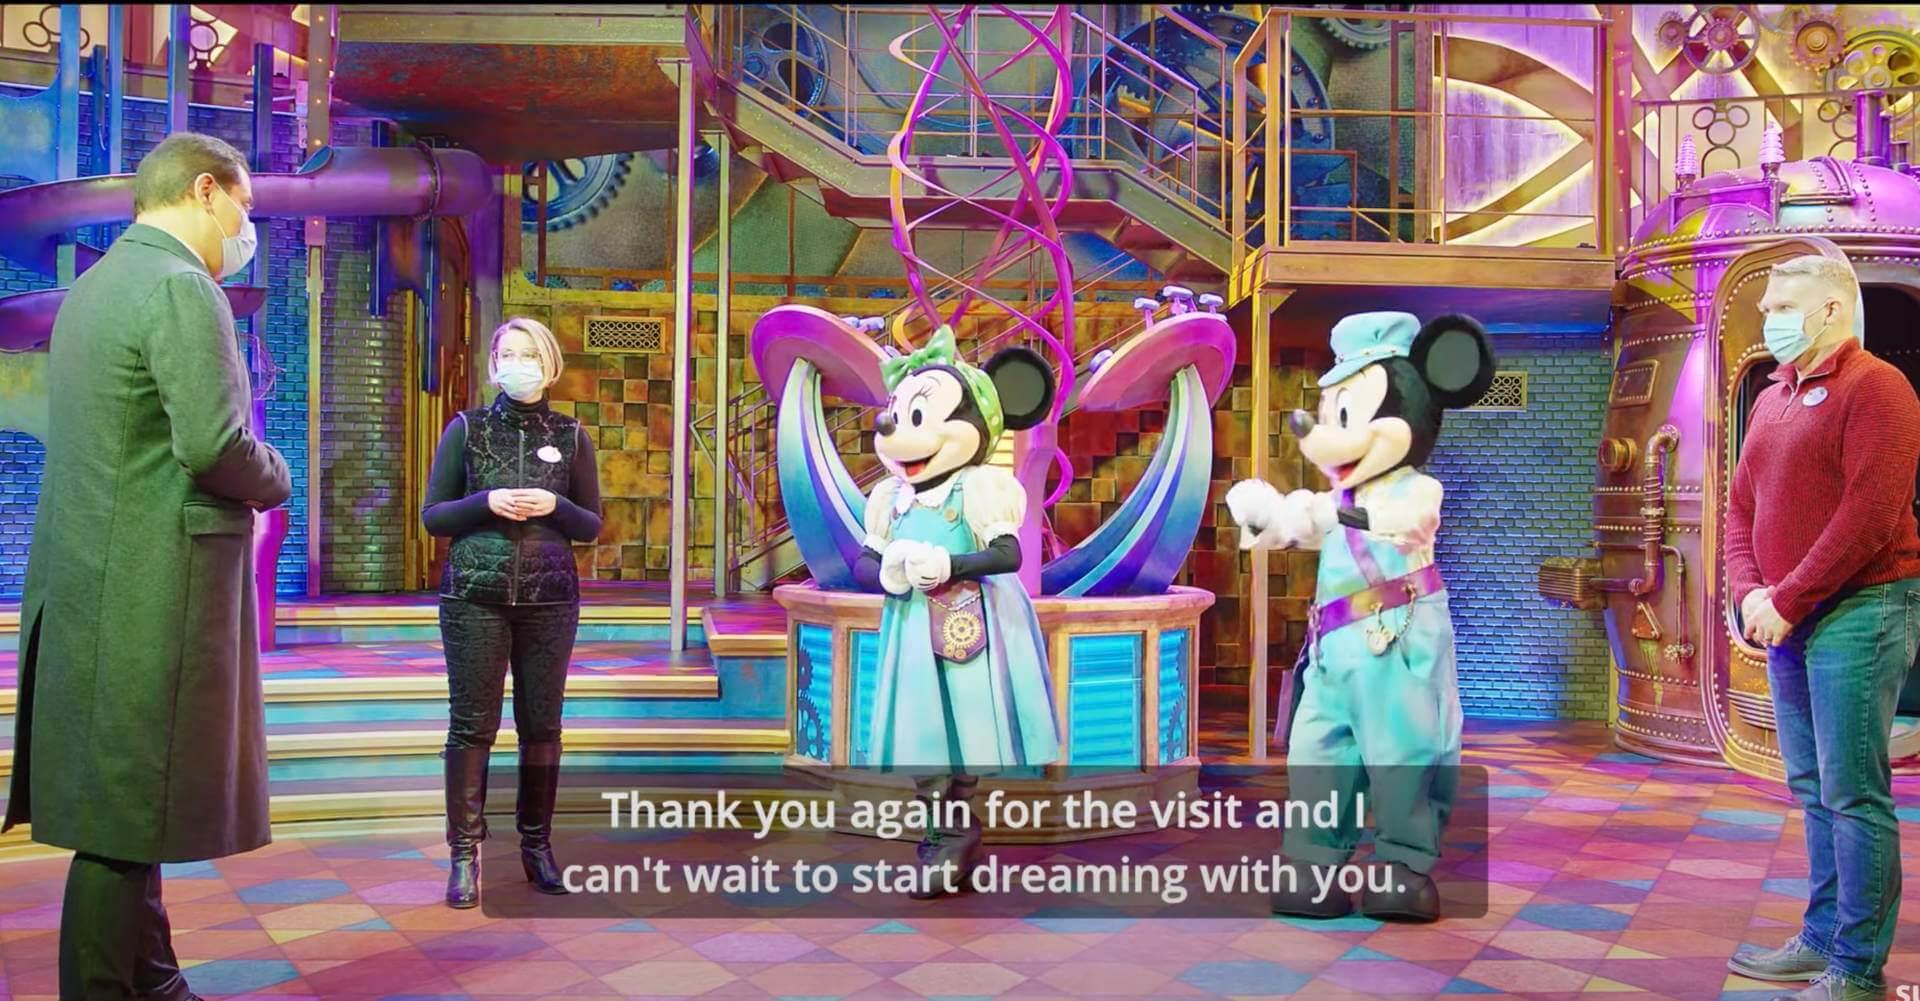 Disneyland Paris Dream Factory Show - MiceChat